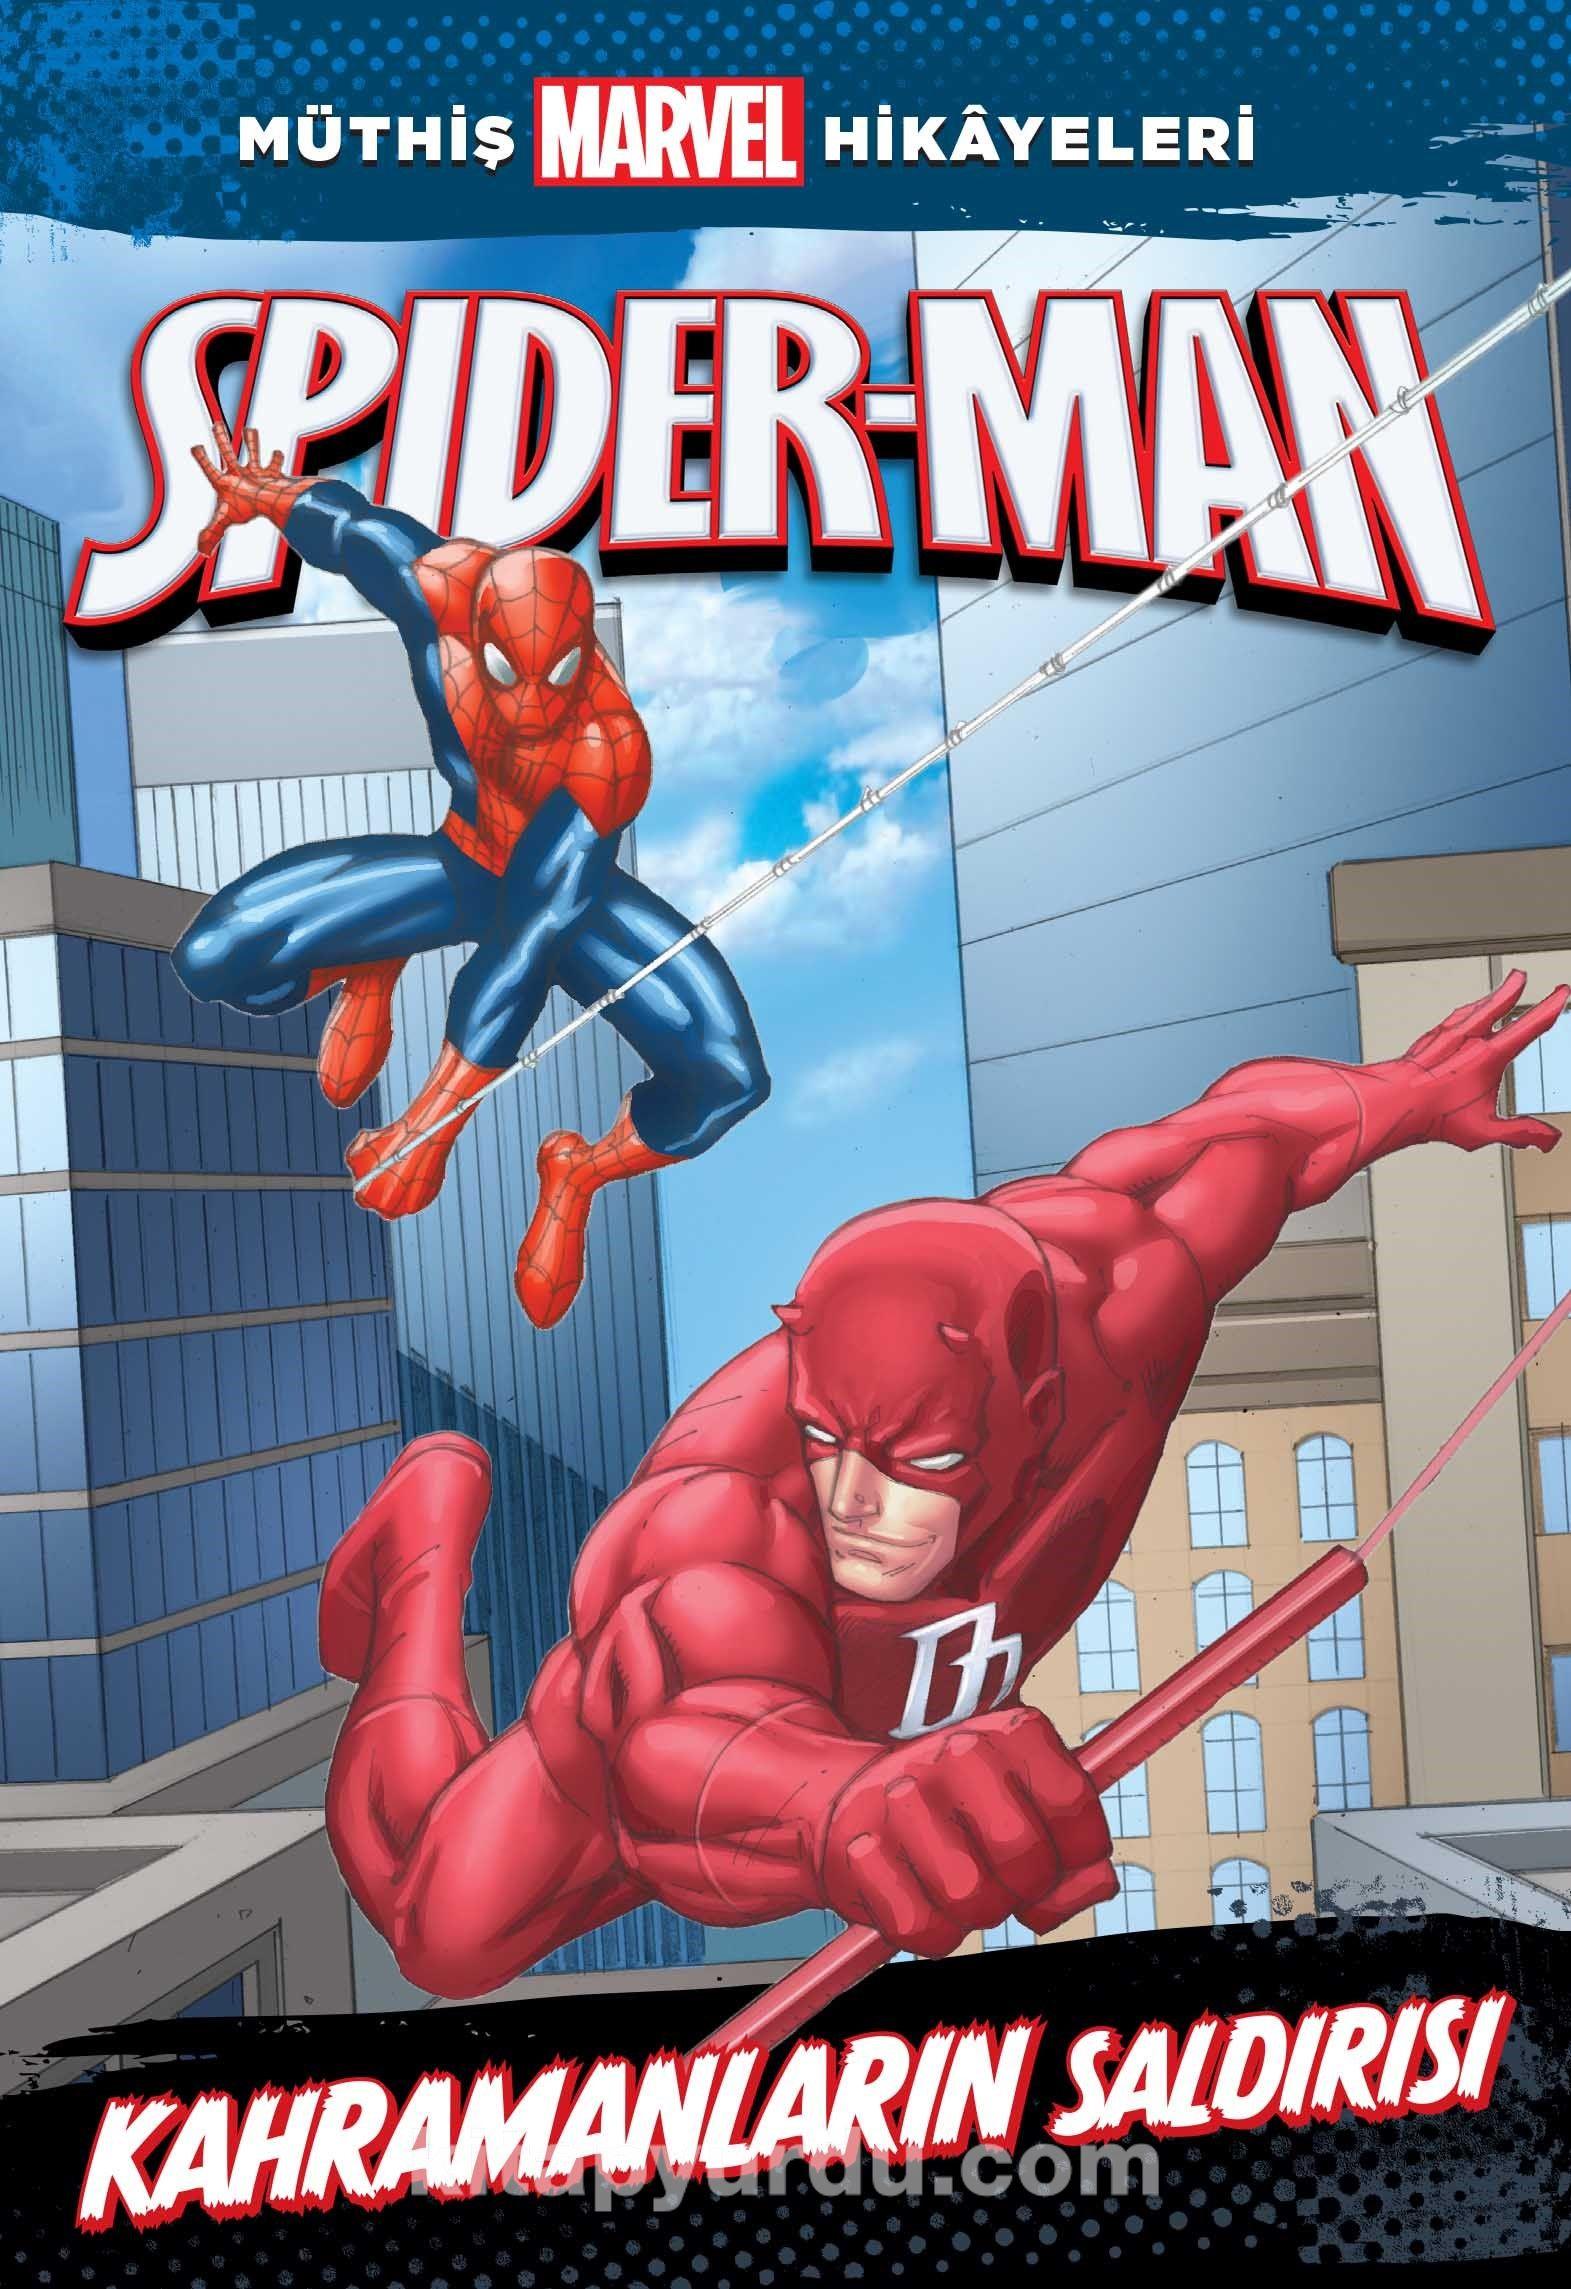 Müthiş Marvel Hikayeleri / Spider-Man Kahramanların Saldırısı - Rich Thomas JR. pdf epub